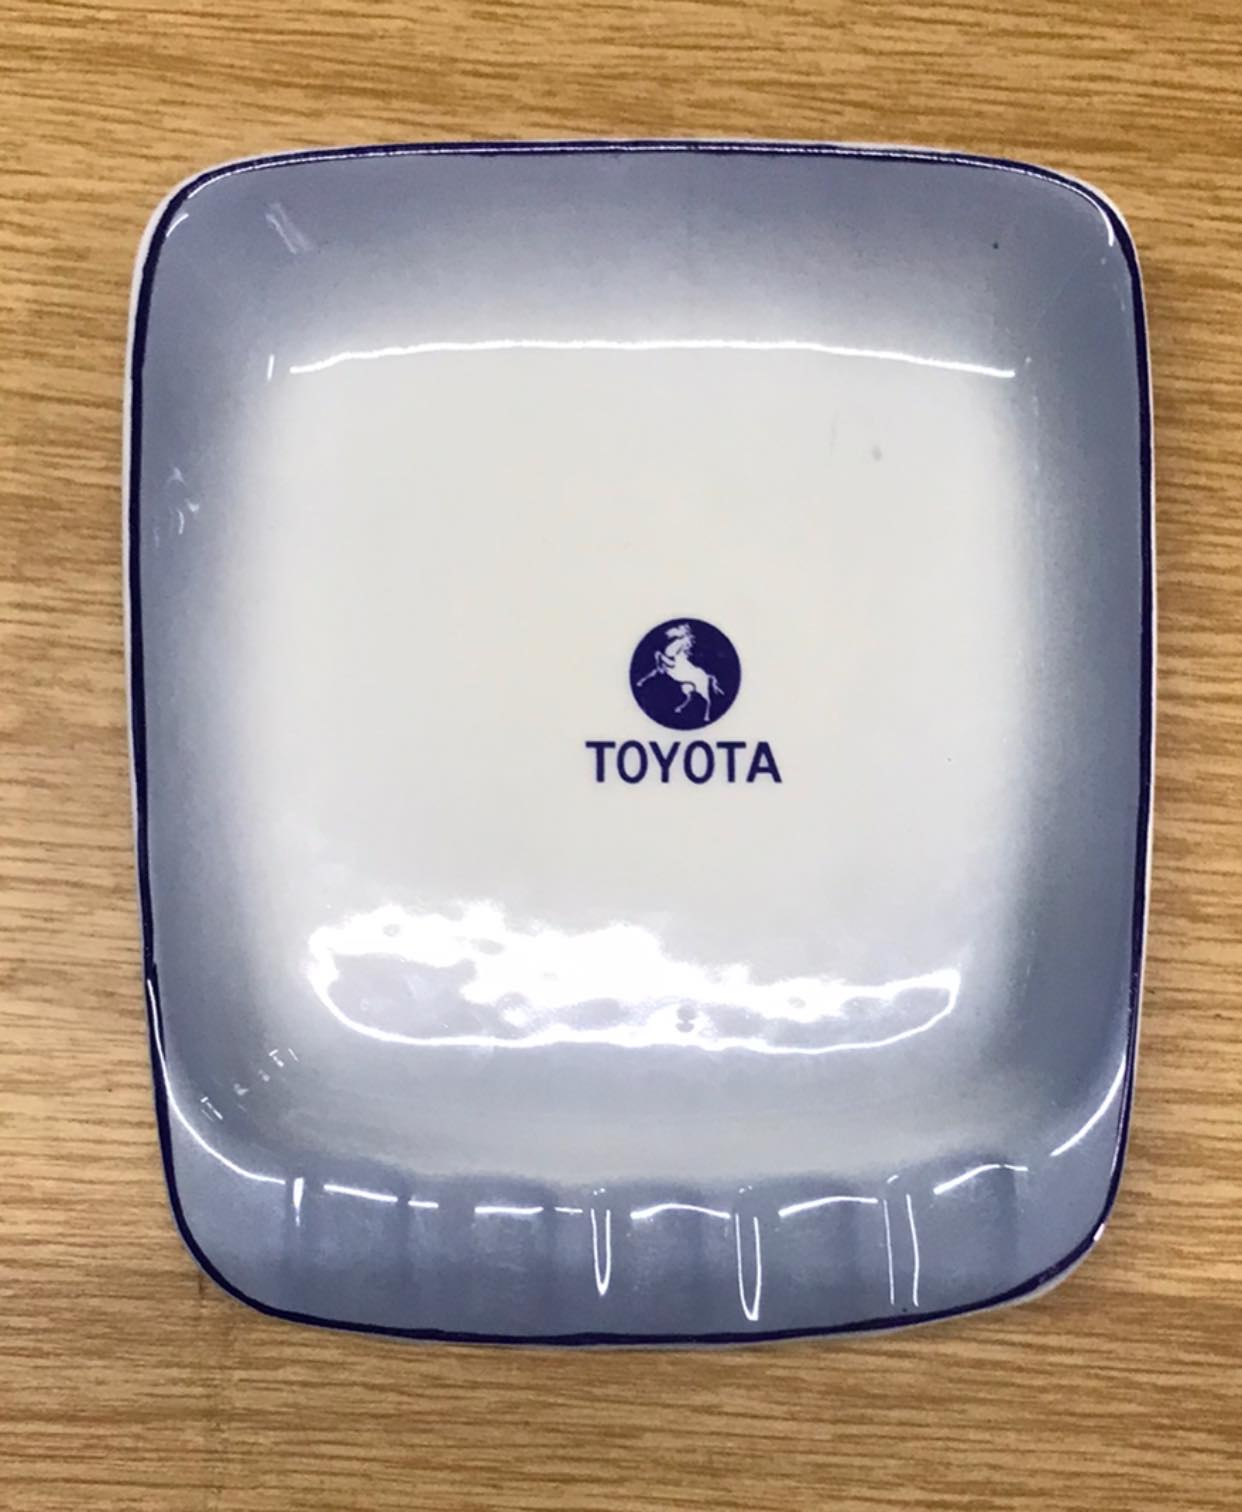 Toyota Ashtray